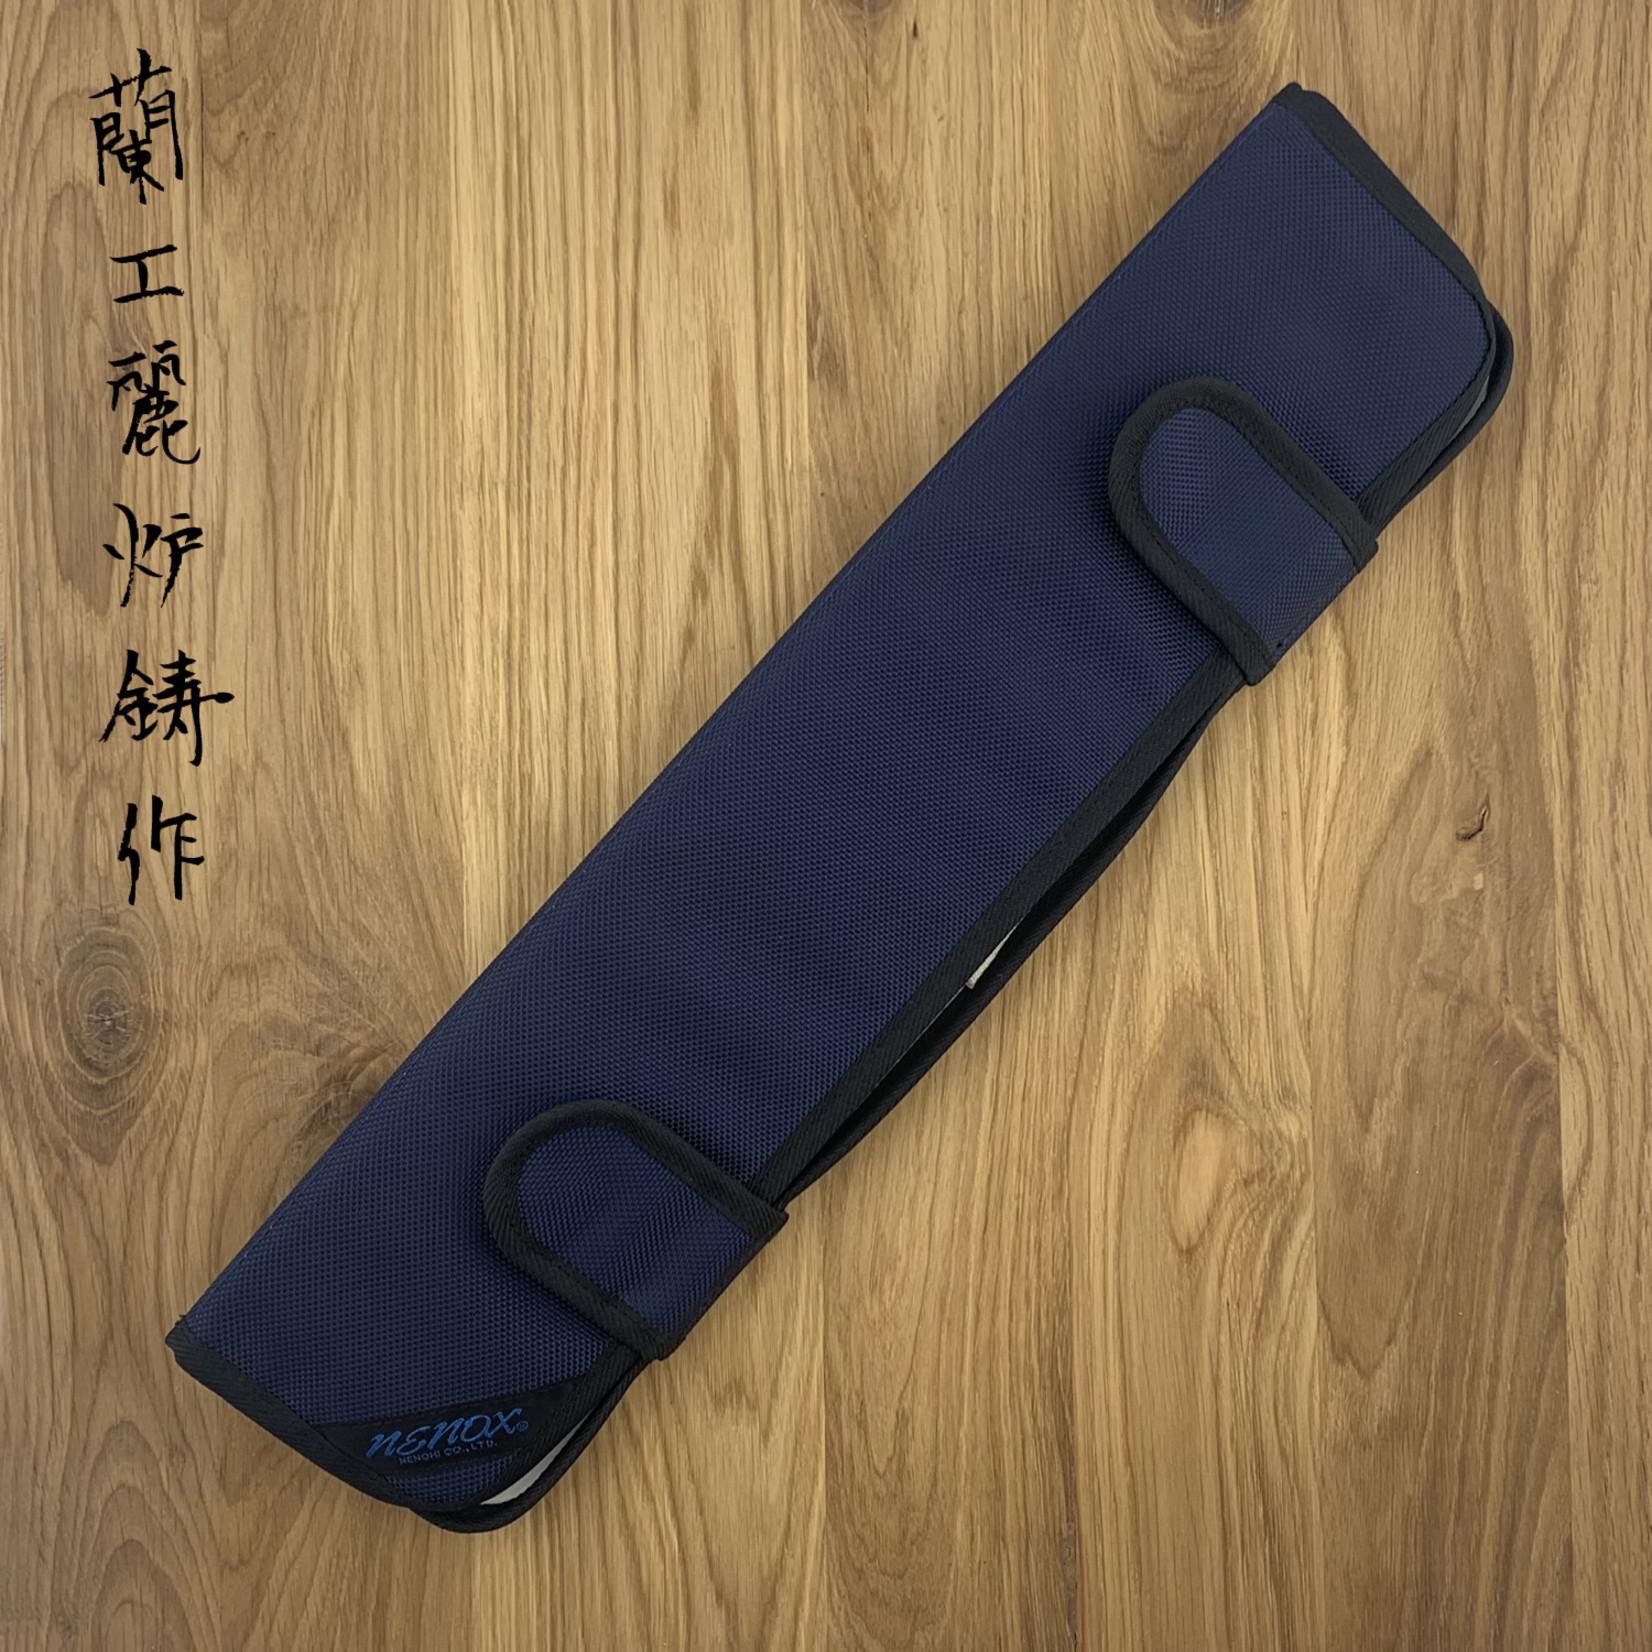 NENOHI NENOX knifebag 2 items in blauw